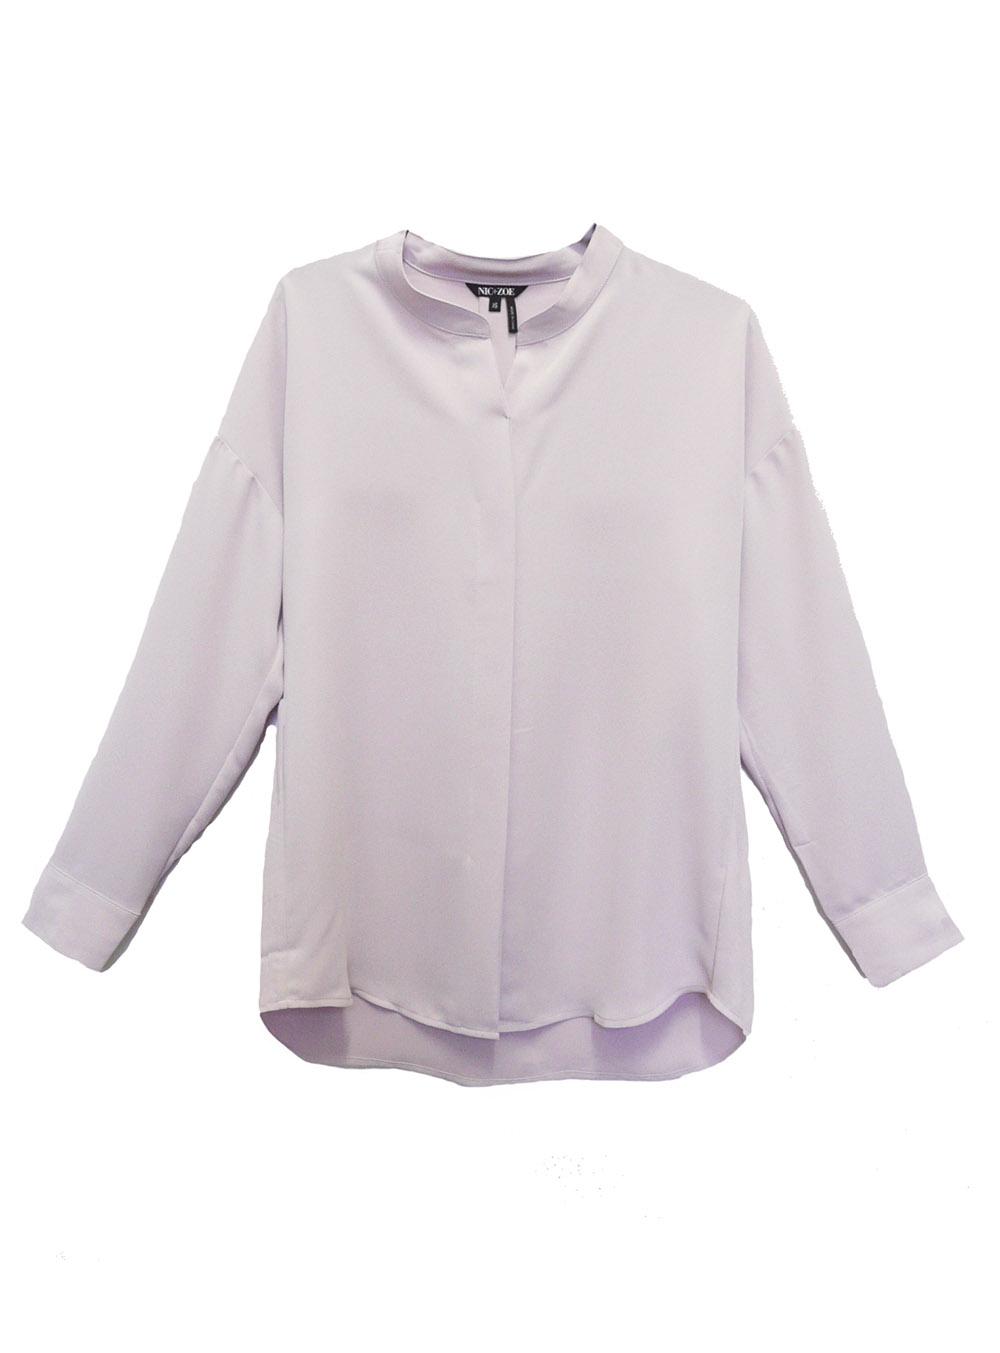 bls lavender big shirt.jpg